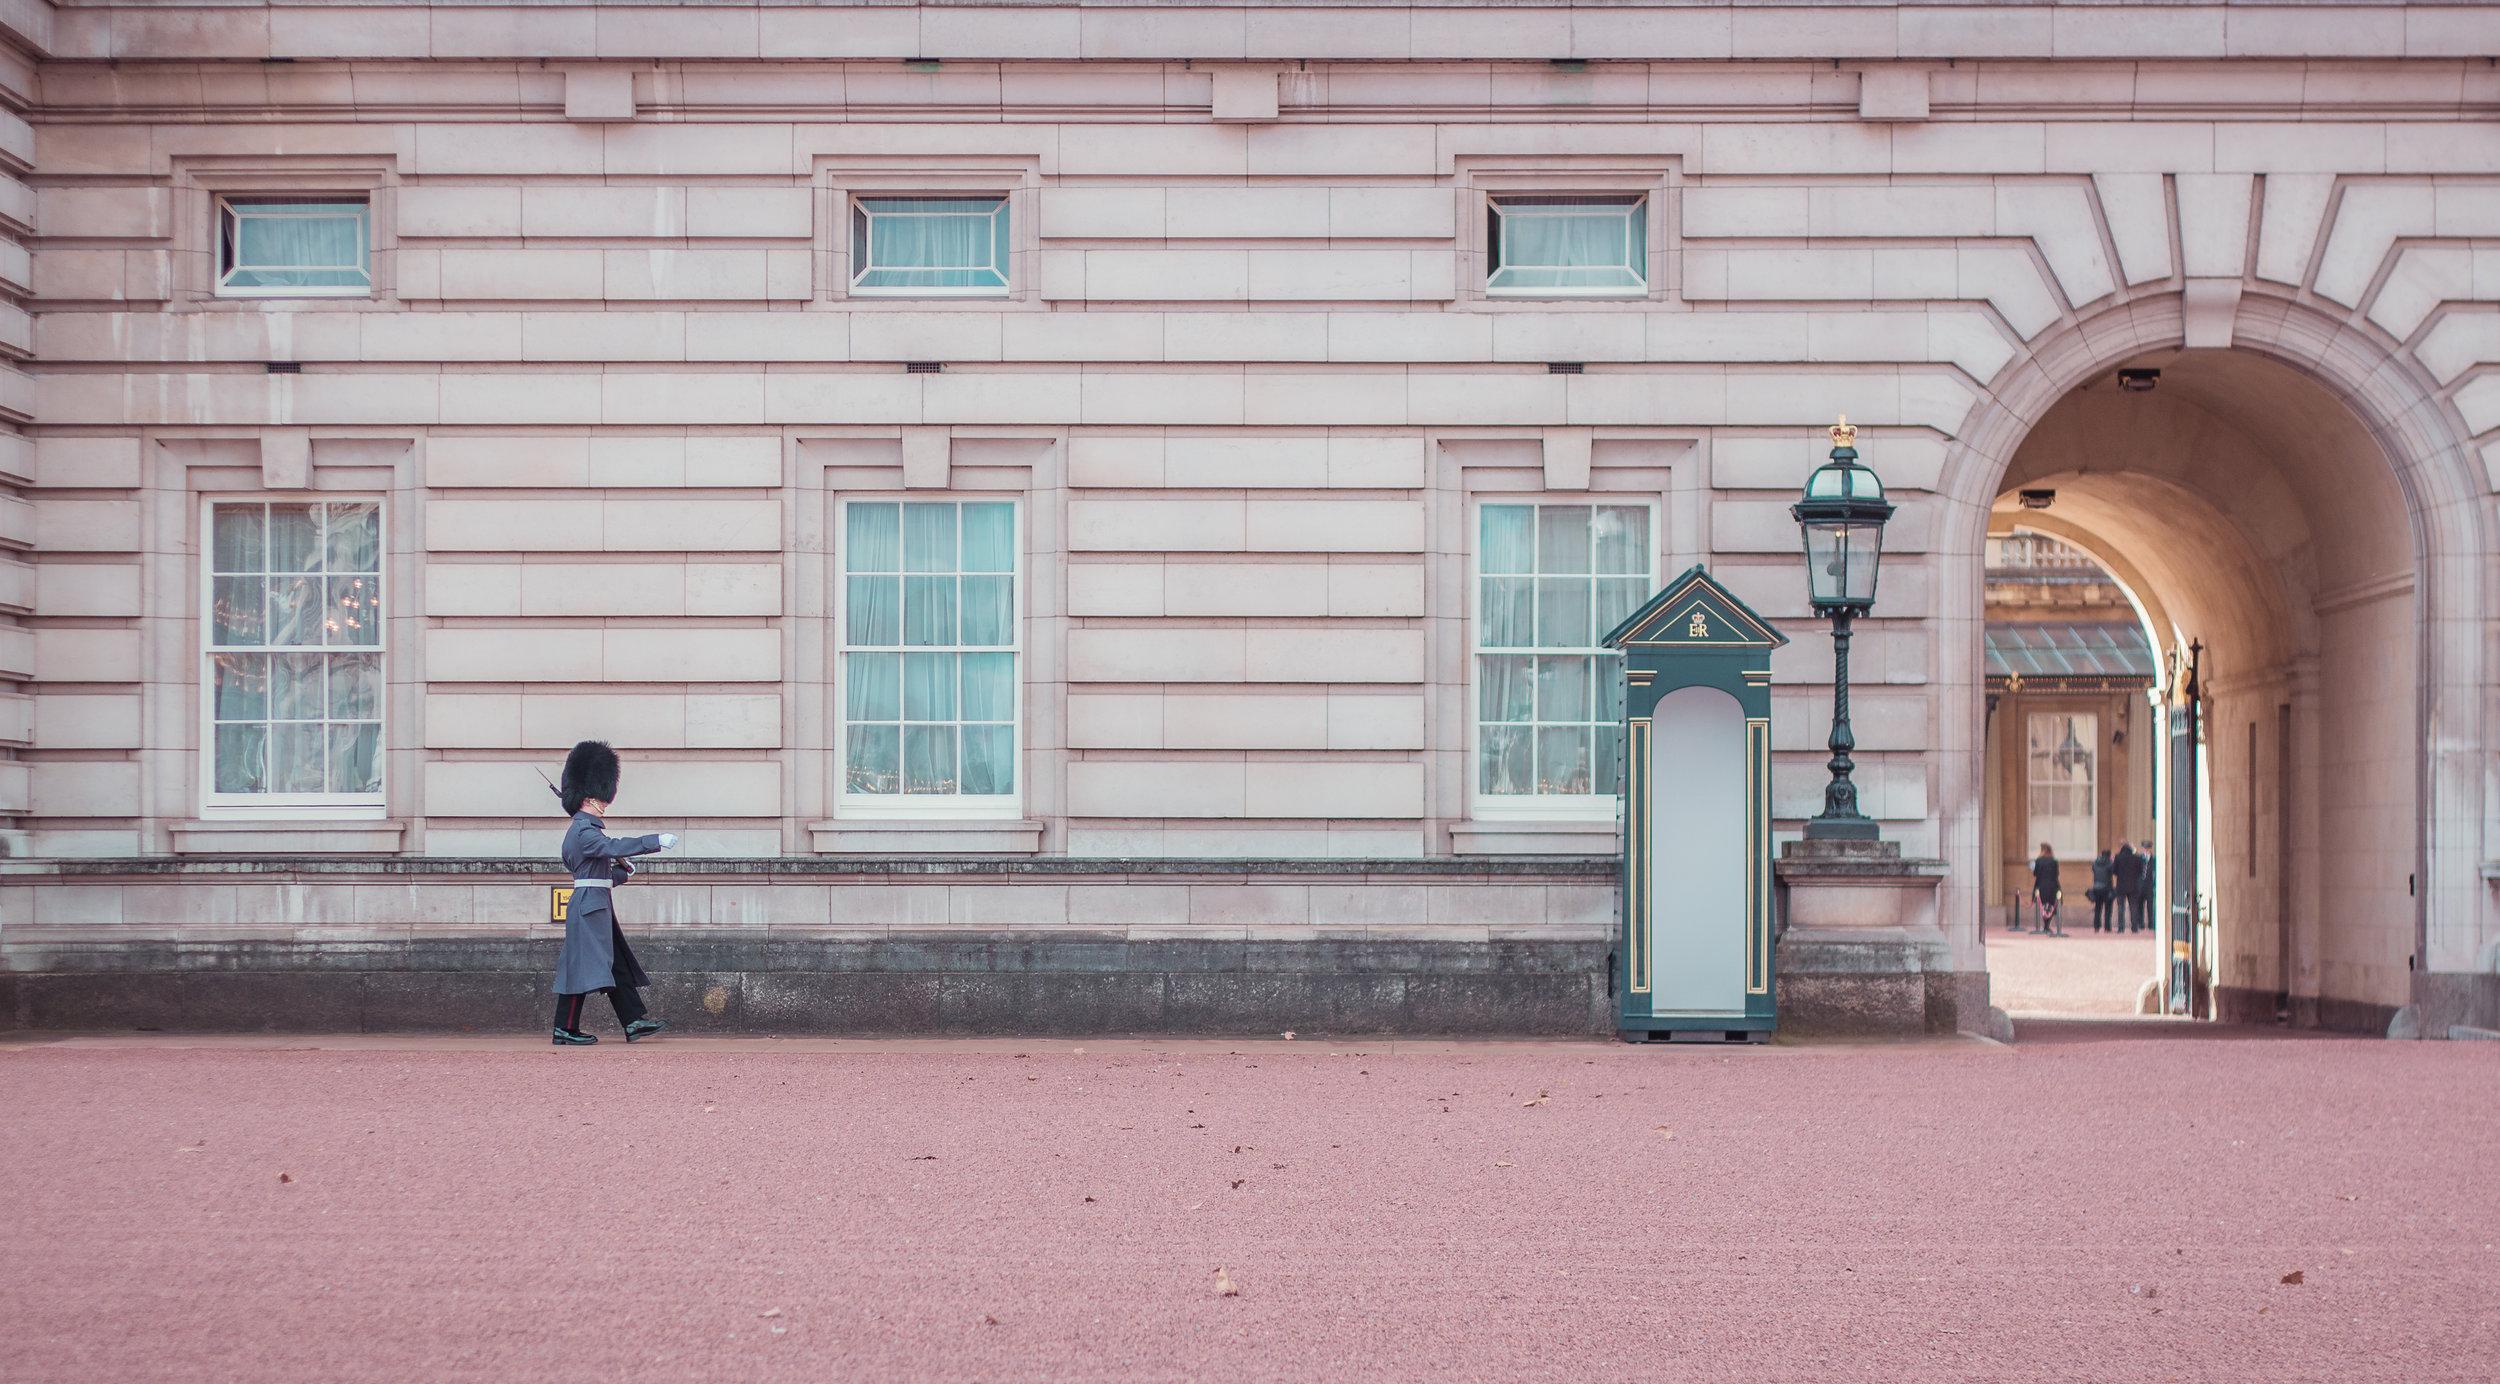 Westminster, St. James & Mayfair